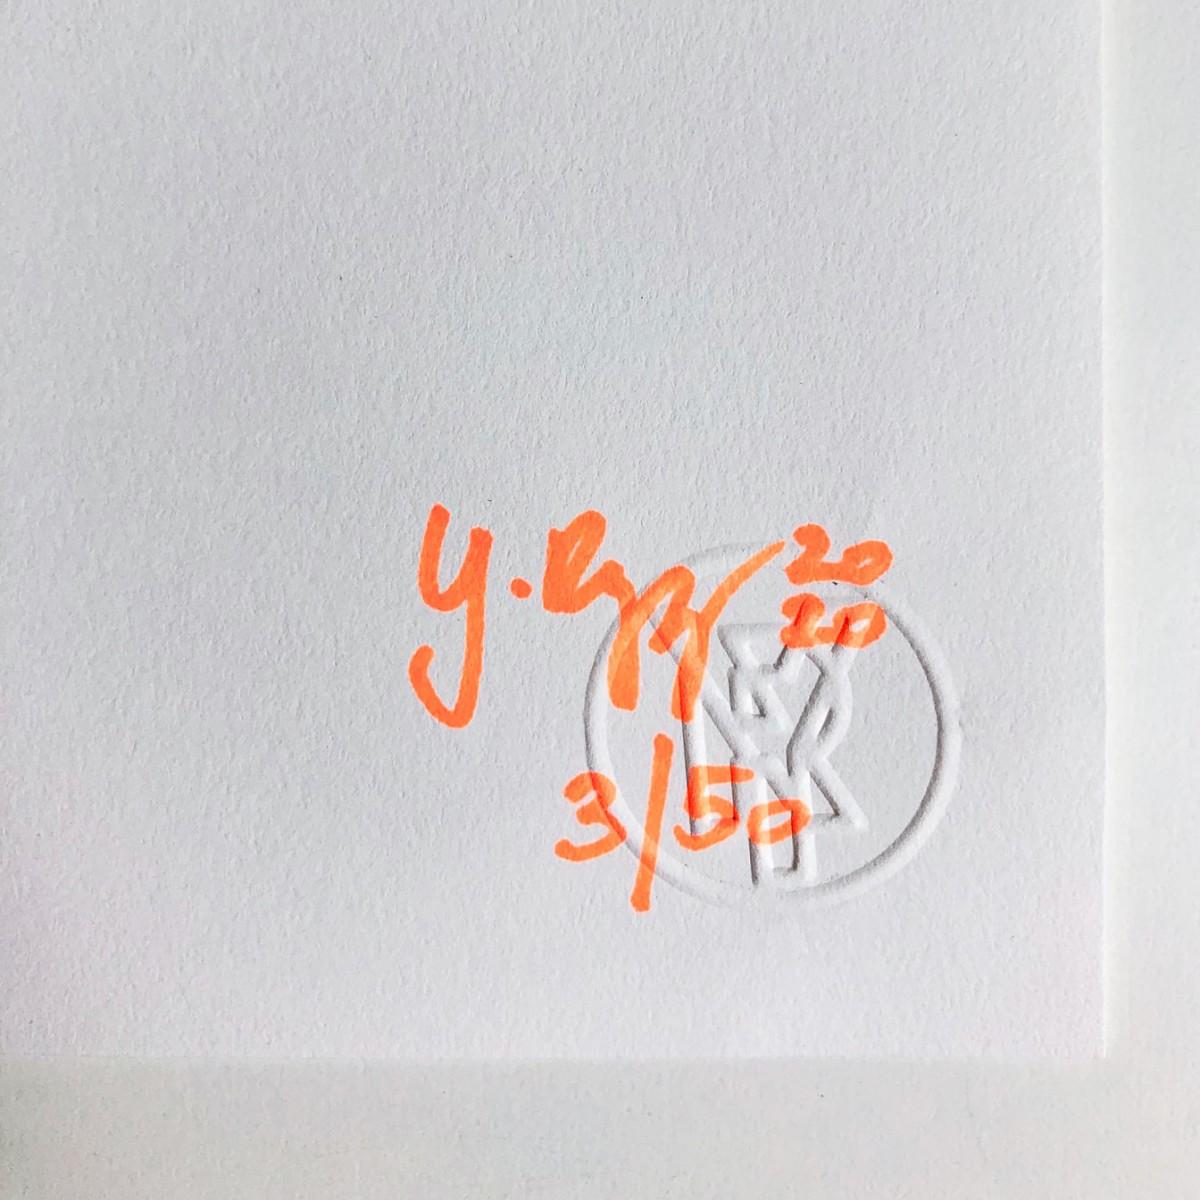 Reingeguckt – YUKY RYANG Risografie, DIN A3